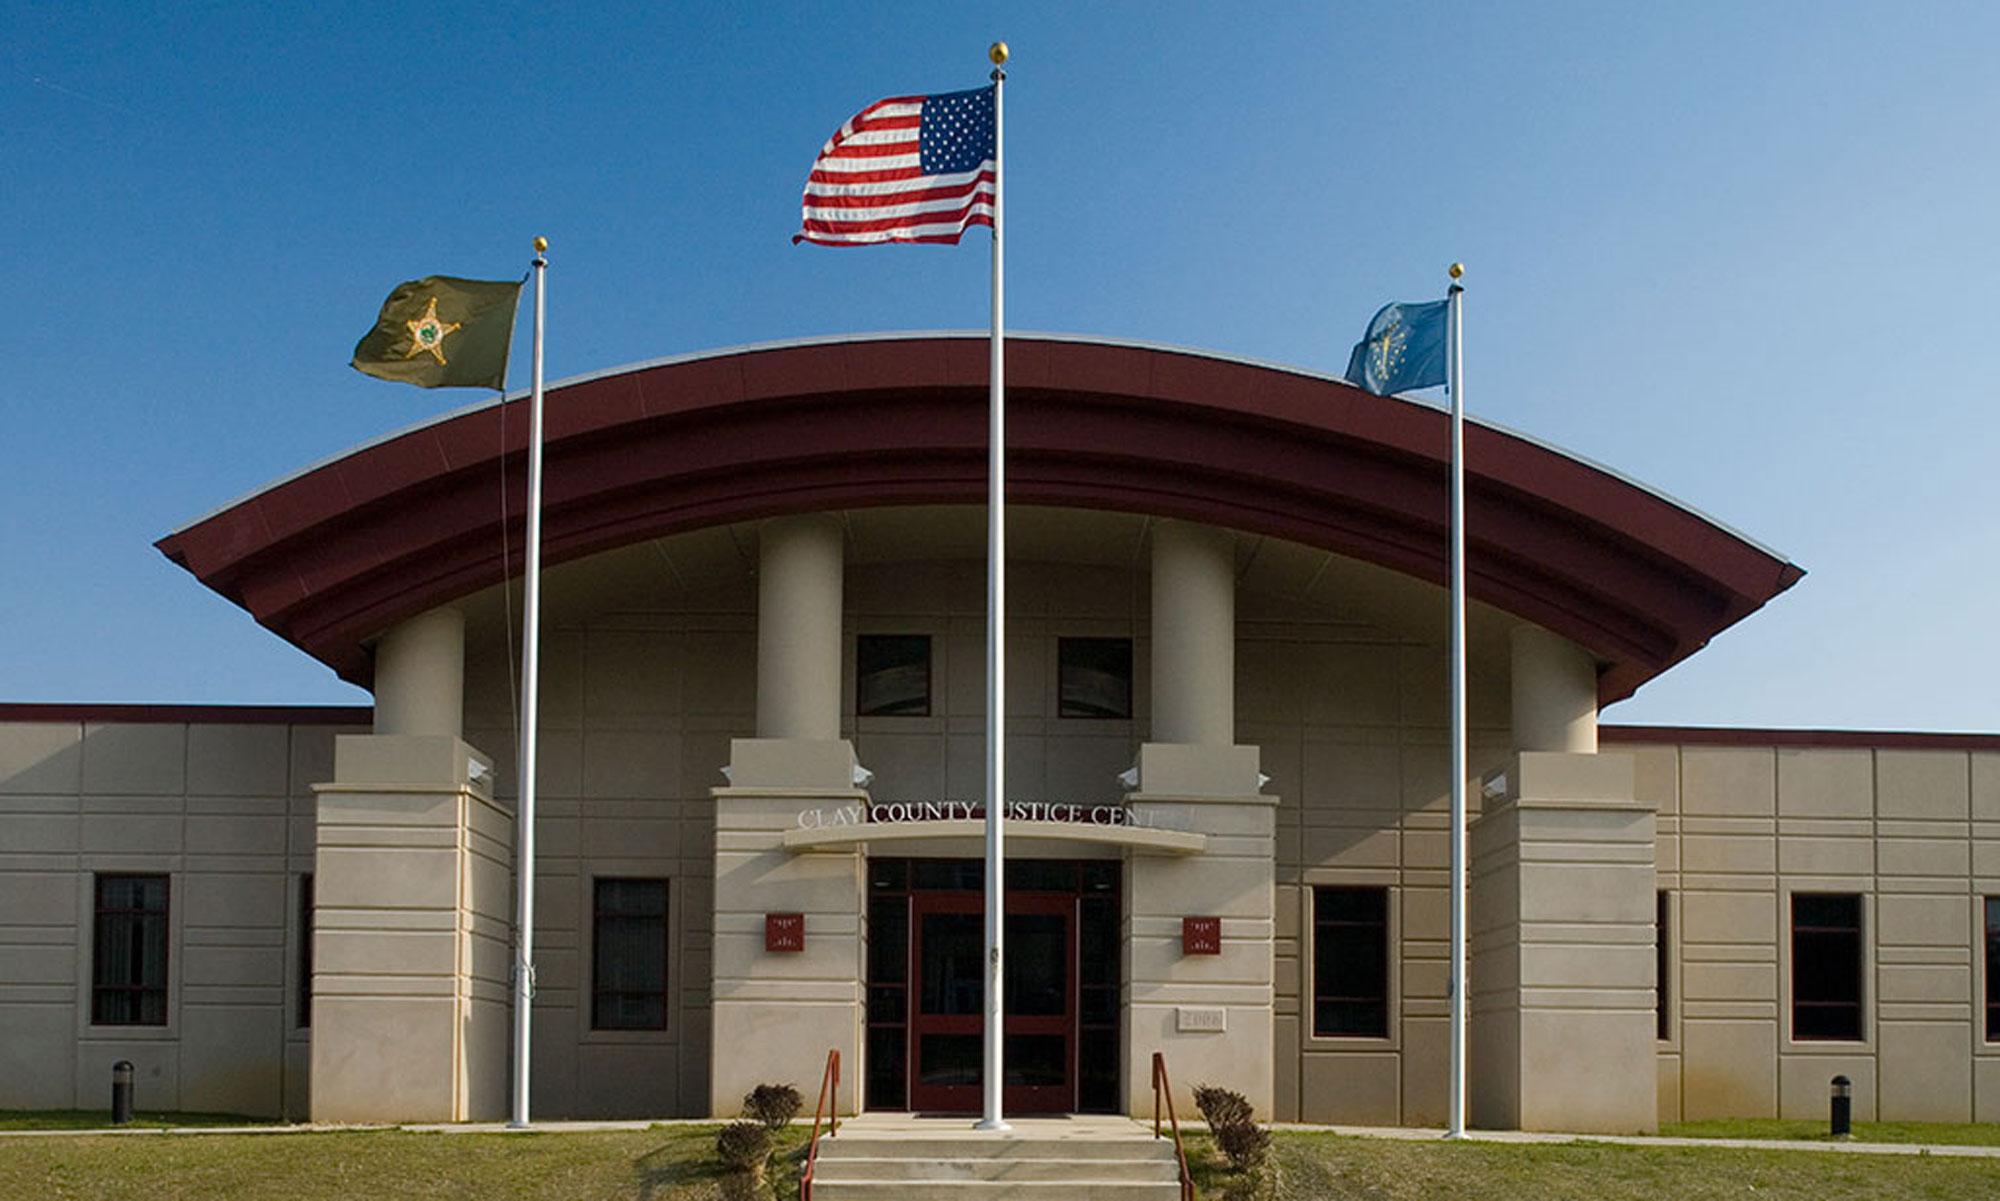 Clay County Jail Exterior